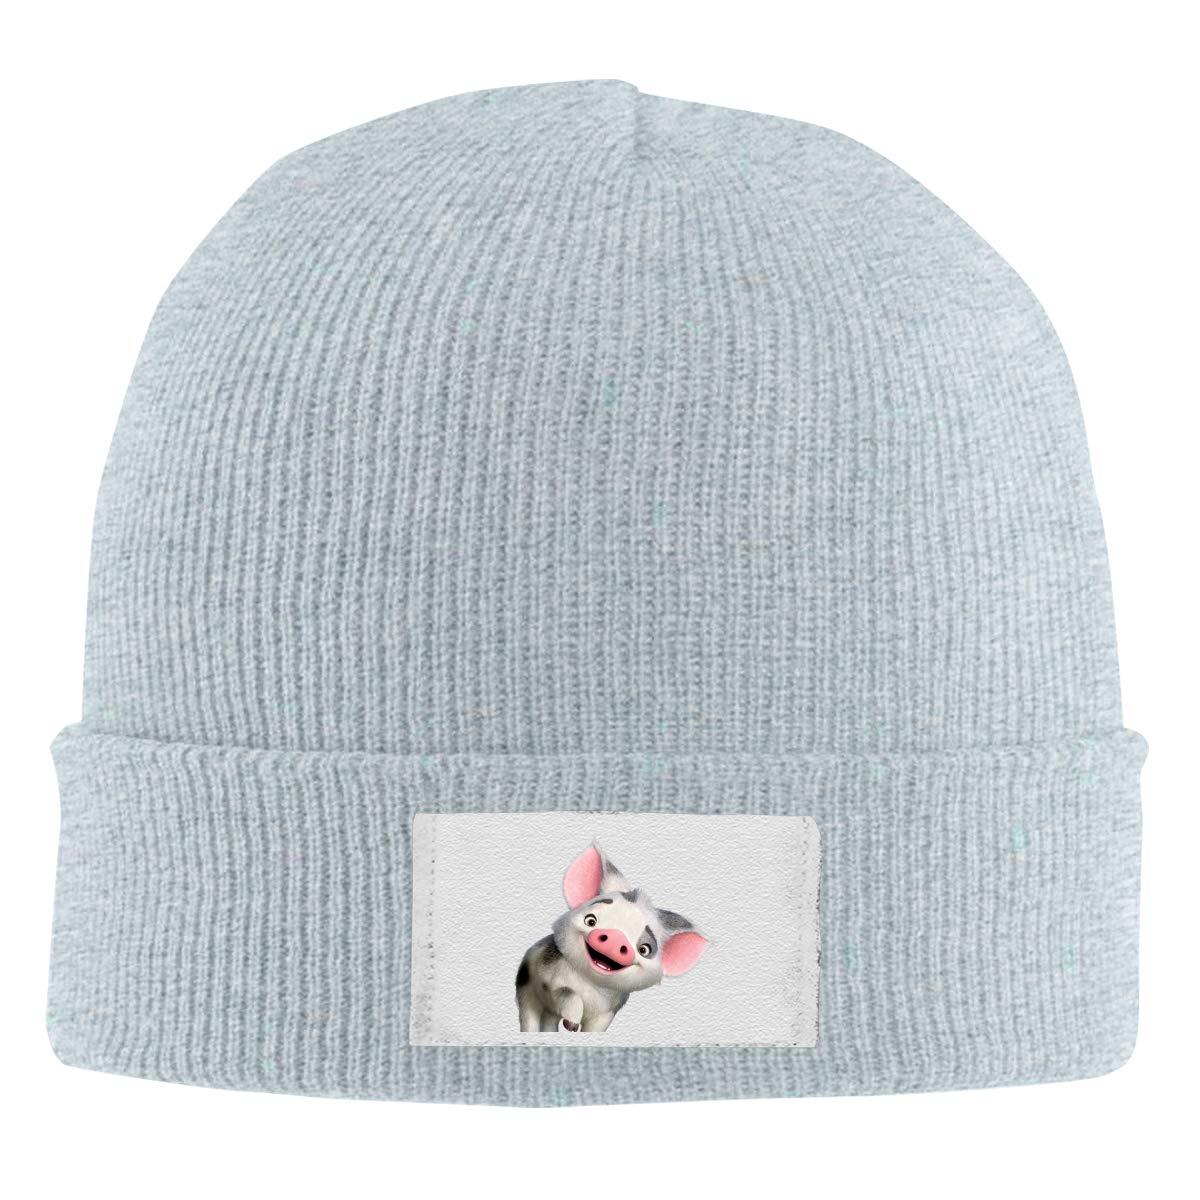 Skull Caps Richard Moana Pua The Pot Bellied Pig Logo Winter Warm Knit Hats Stretchy Cuff Beanie Hat Black